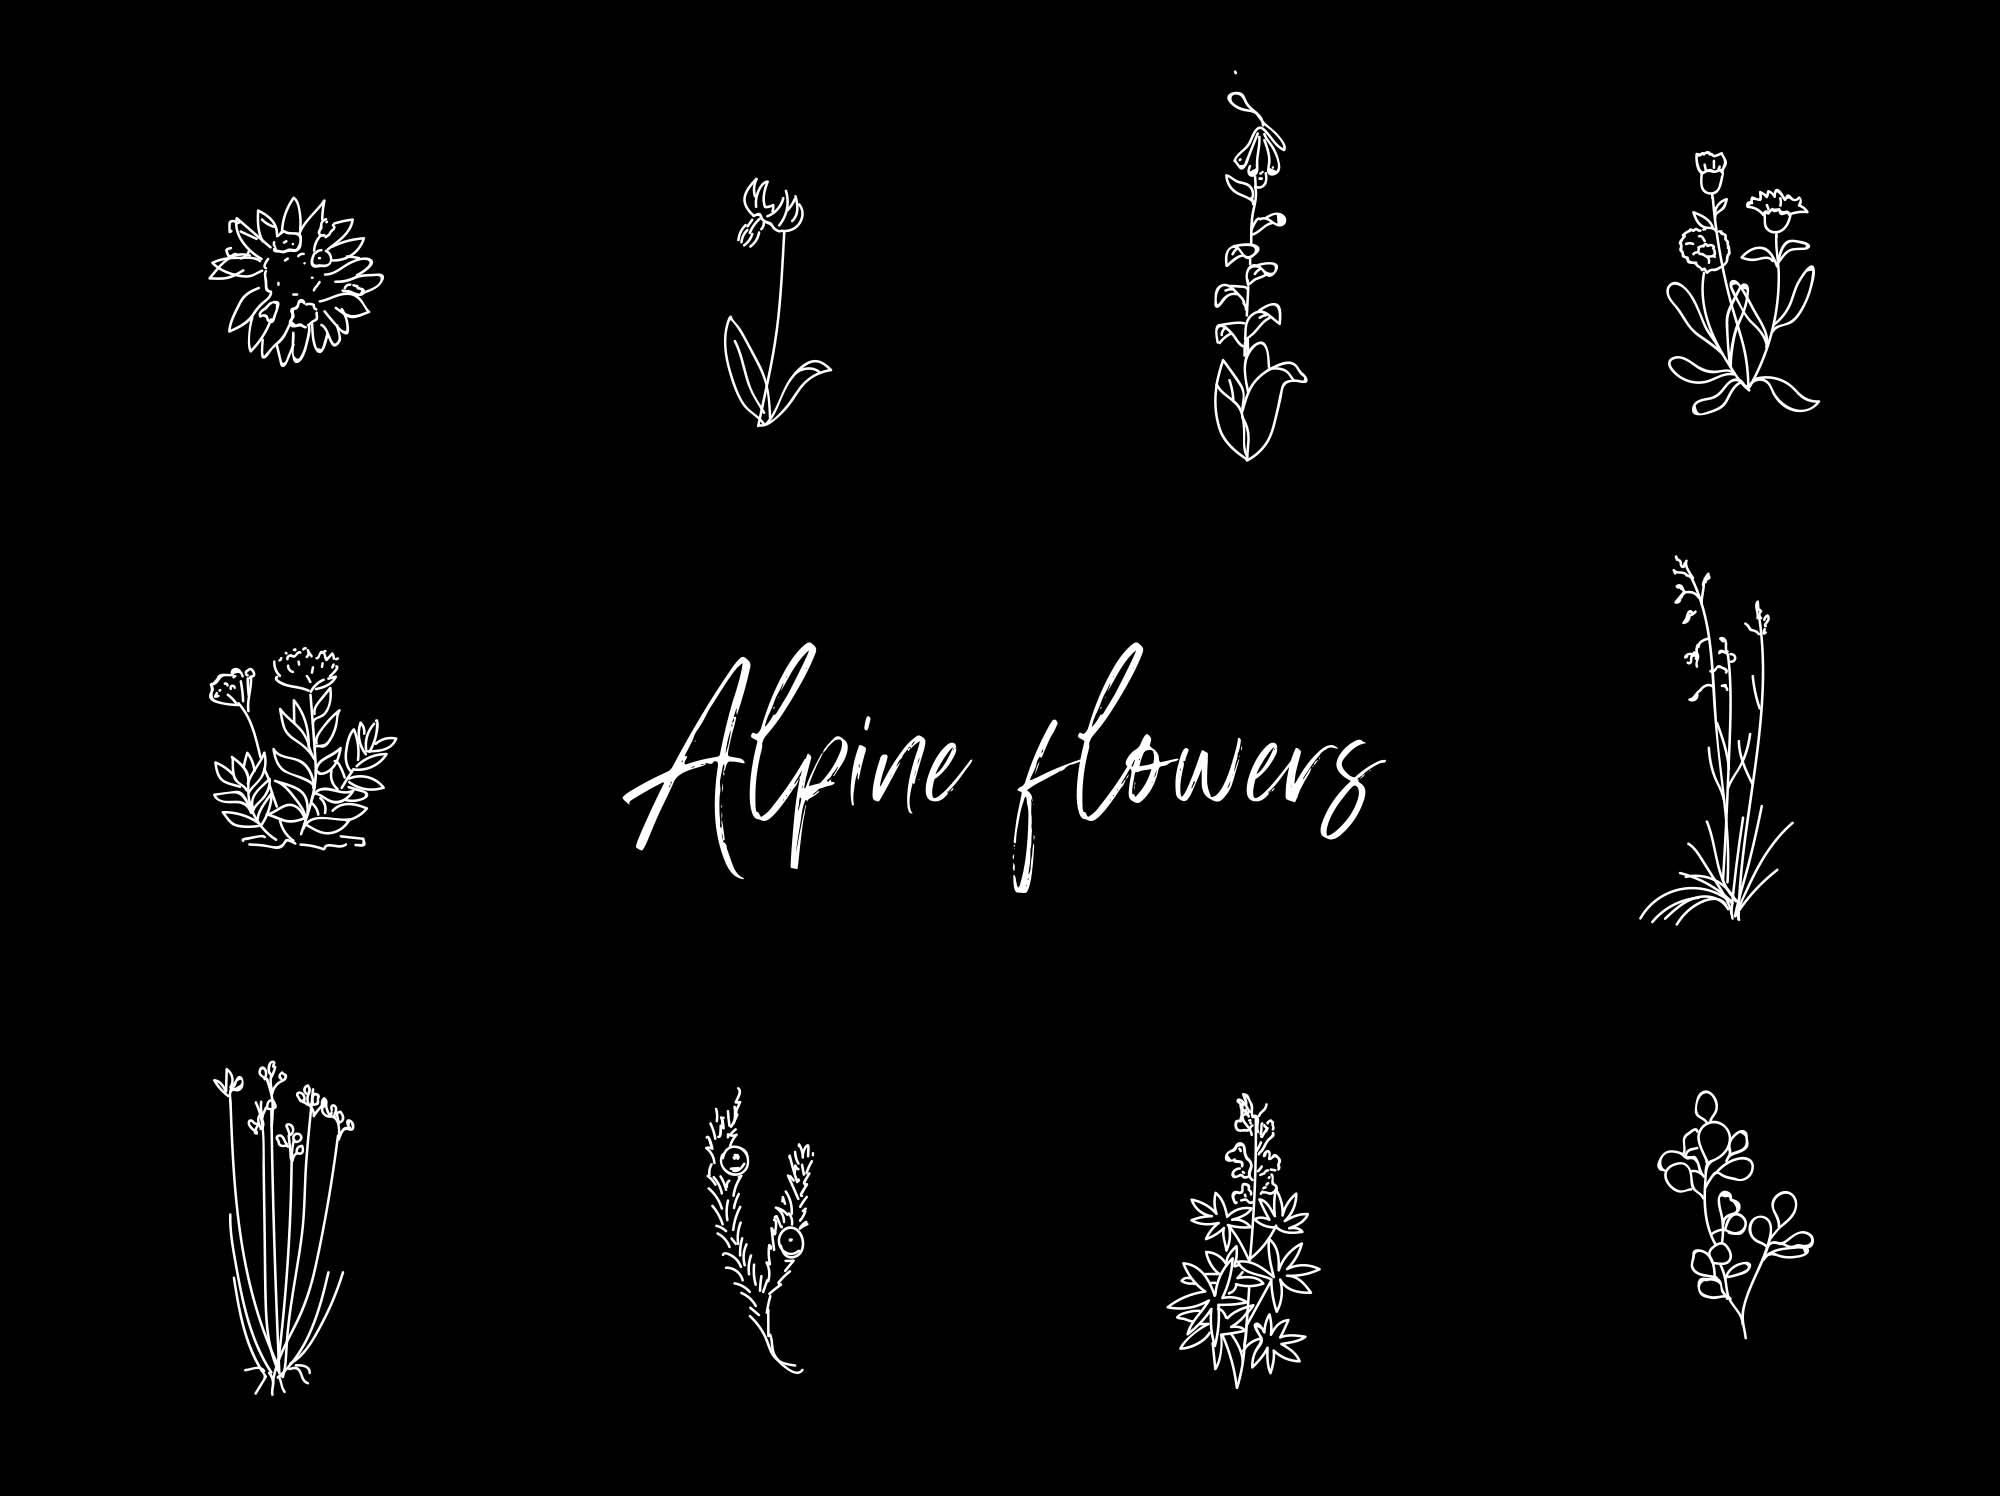 Alpine Hand-drawn Vector Flowers Illustration 2